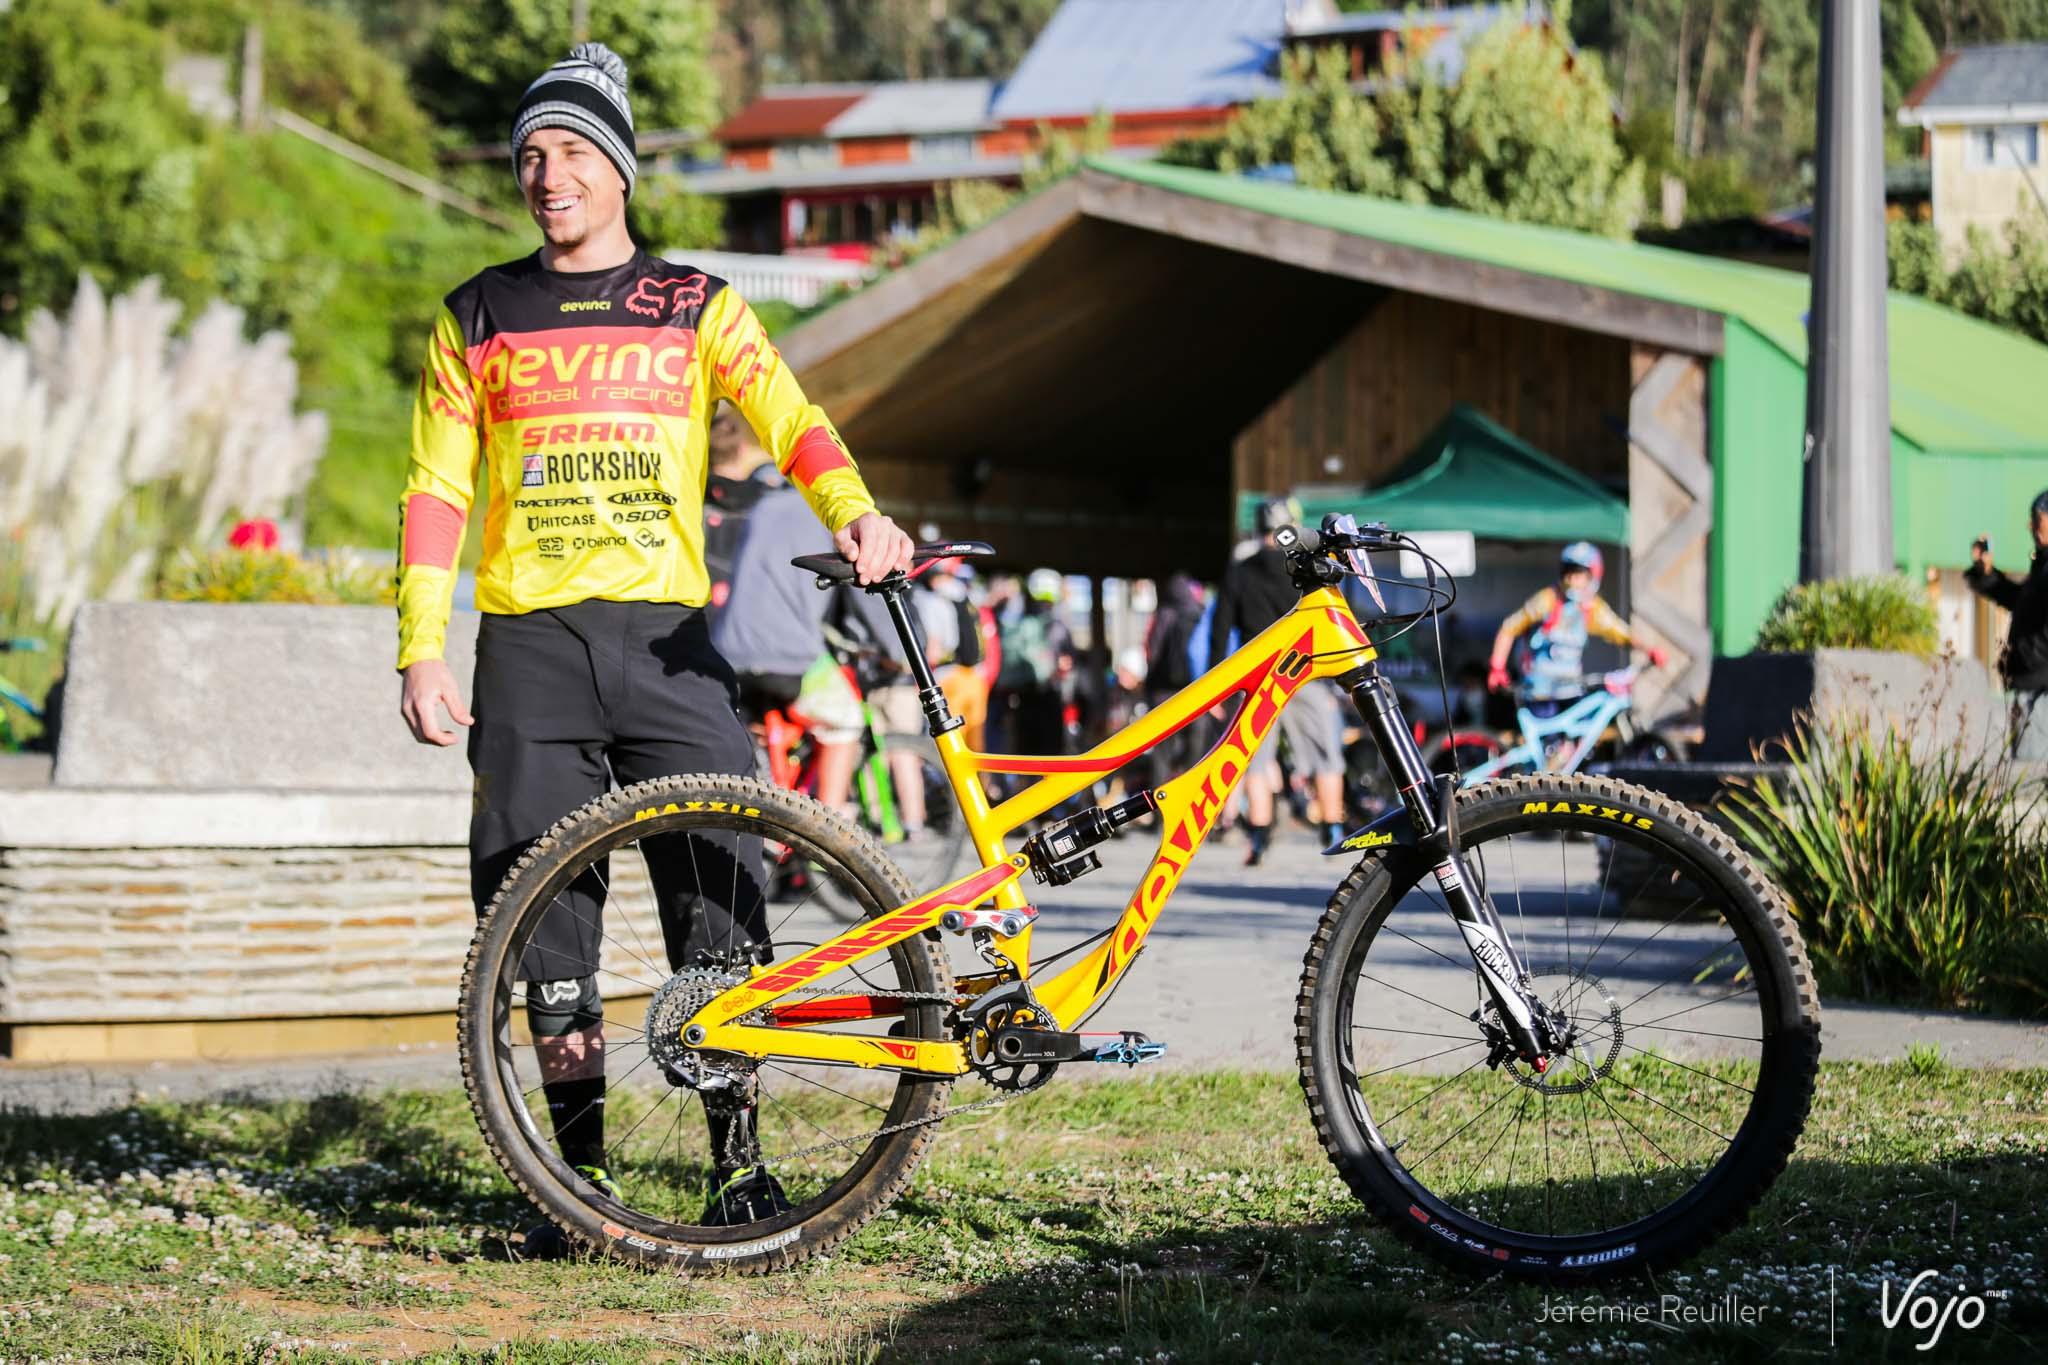 Bike_Check_EWS_Damien_Oton_Copyright_Reuiller_Vojomag-1